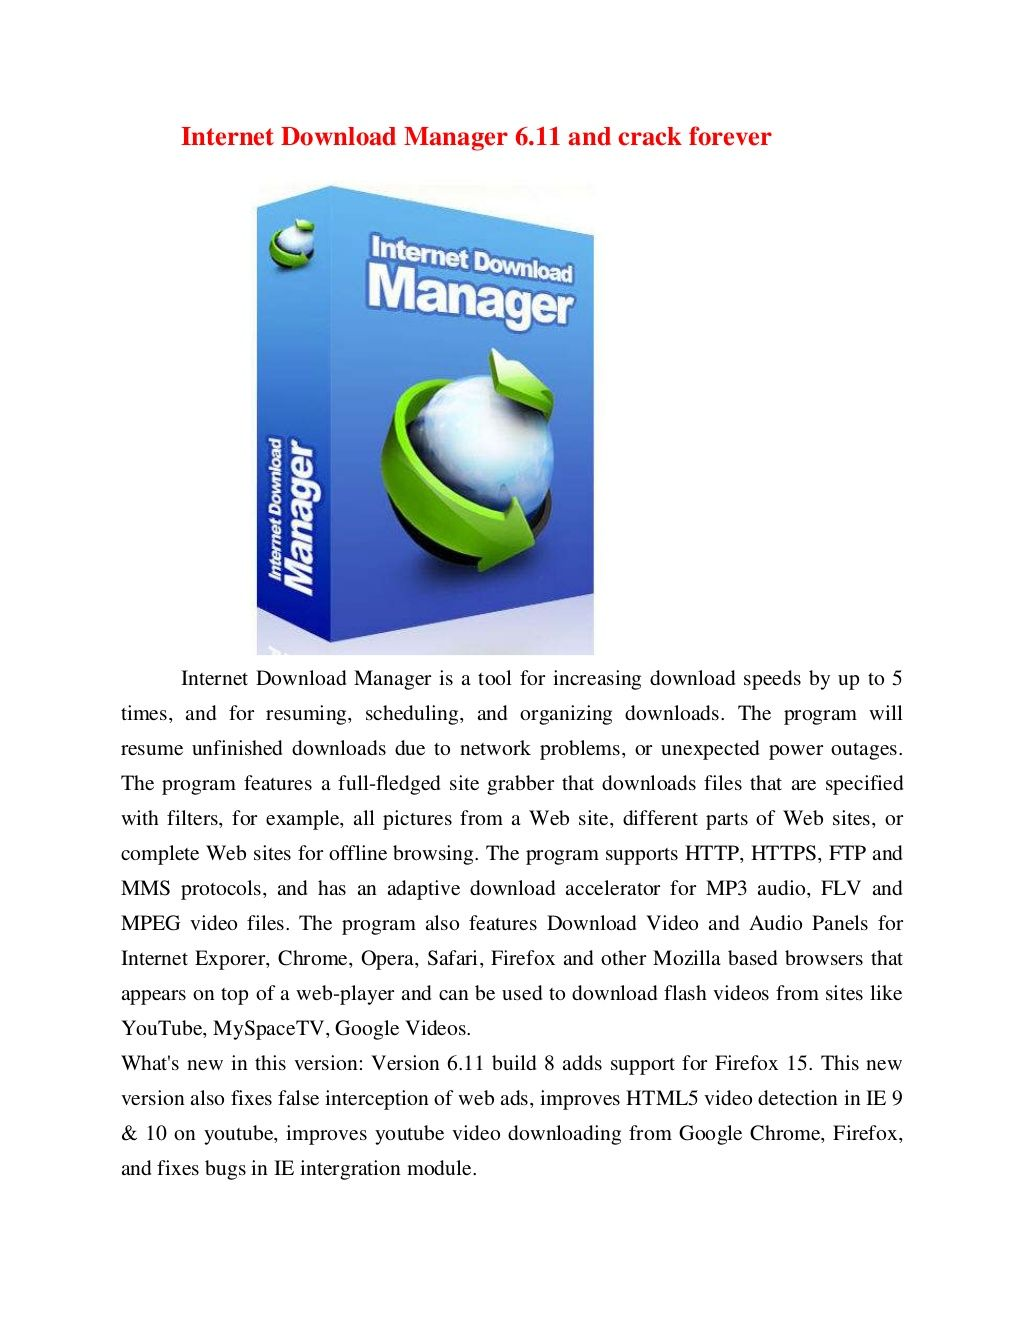 Internet Download Manager 611 And Crack Forever By Vodoi1203 Via